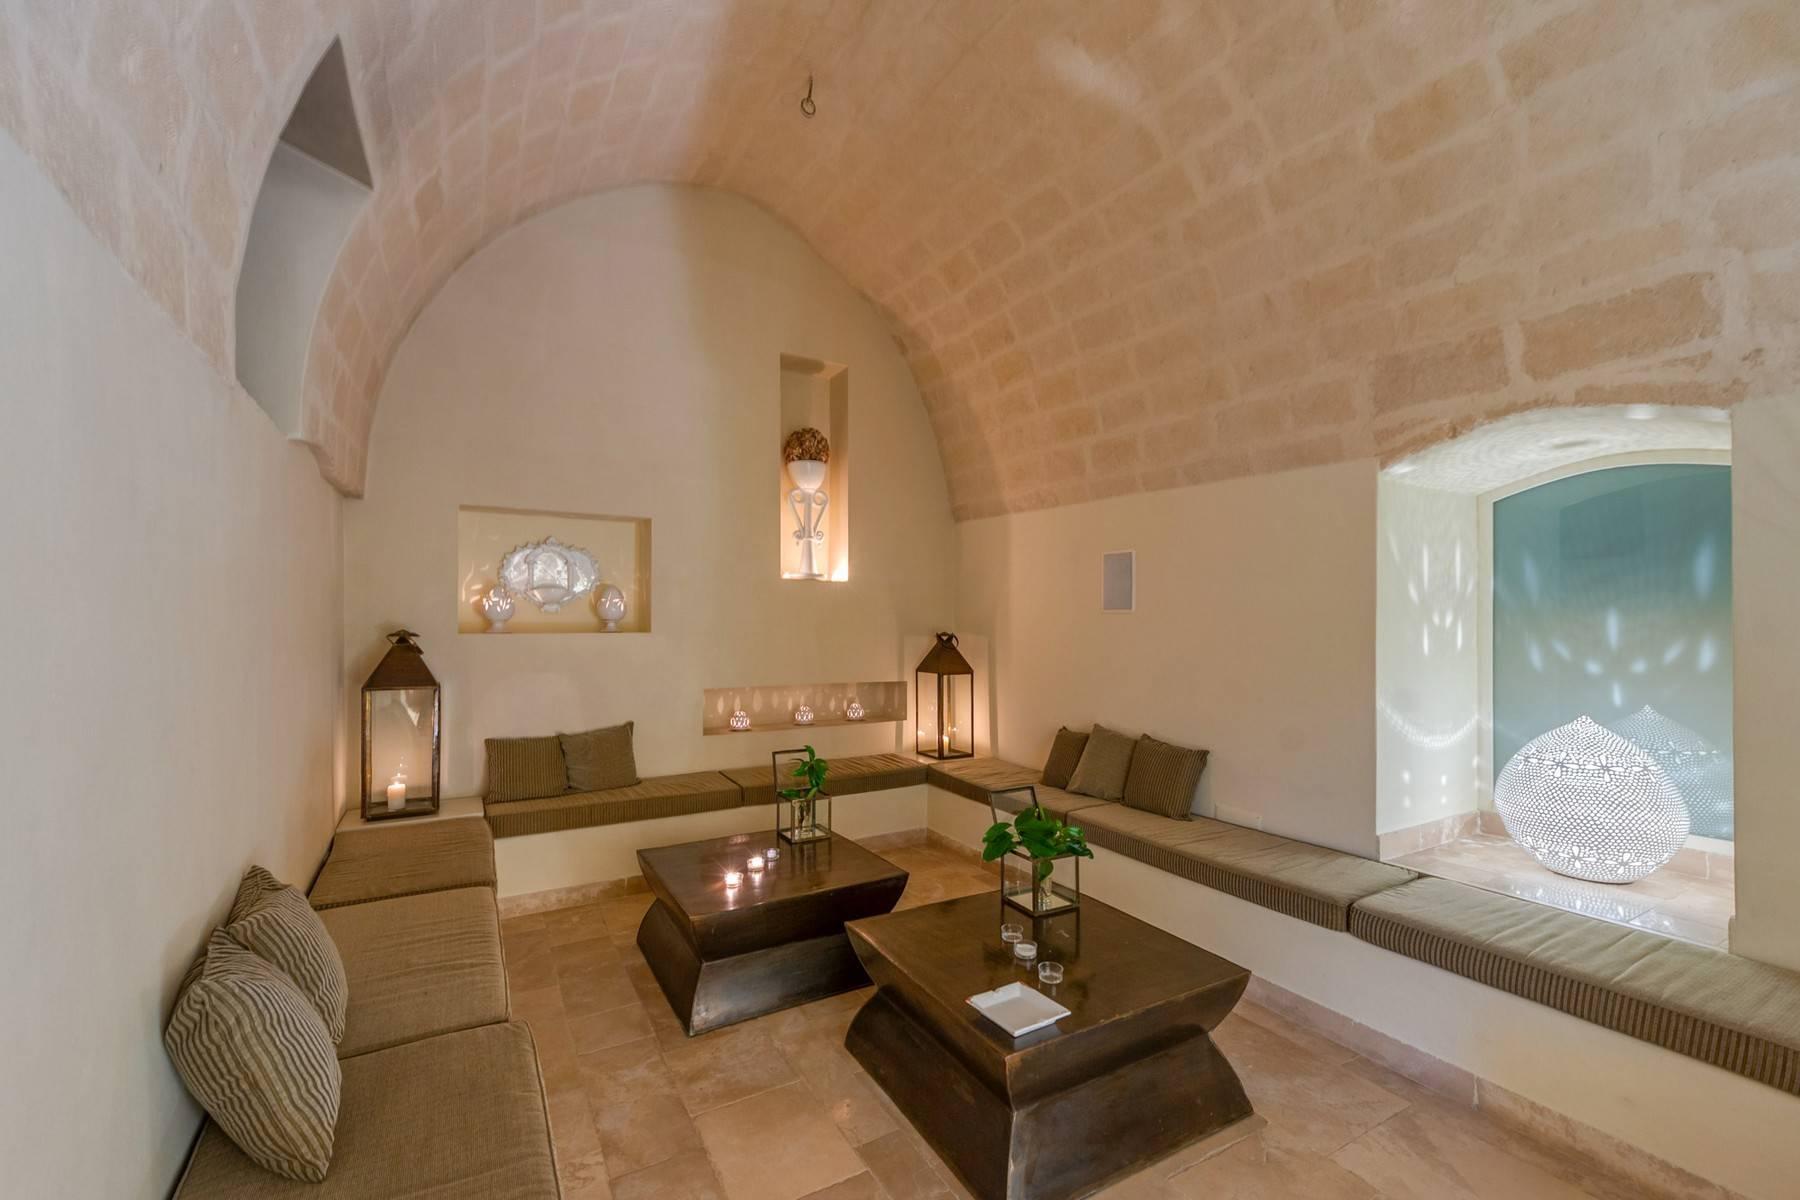 Splendida villa gentilizia del '600 circondata da agrumeti - 40